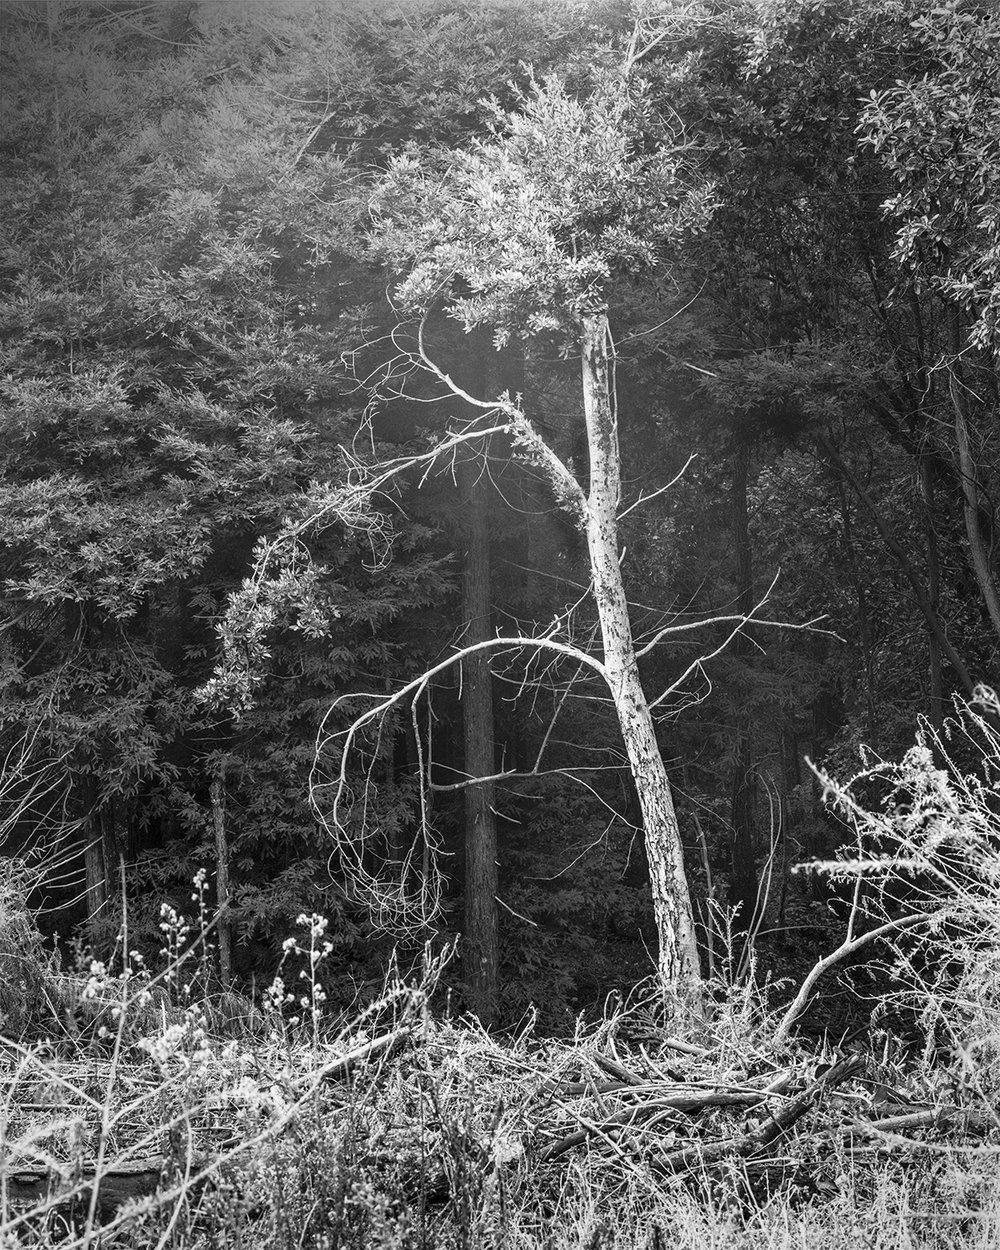 Dead Tree, San Francisco, CA 2017